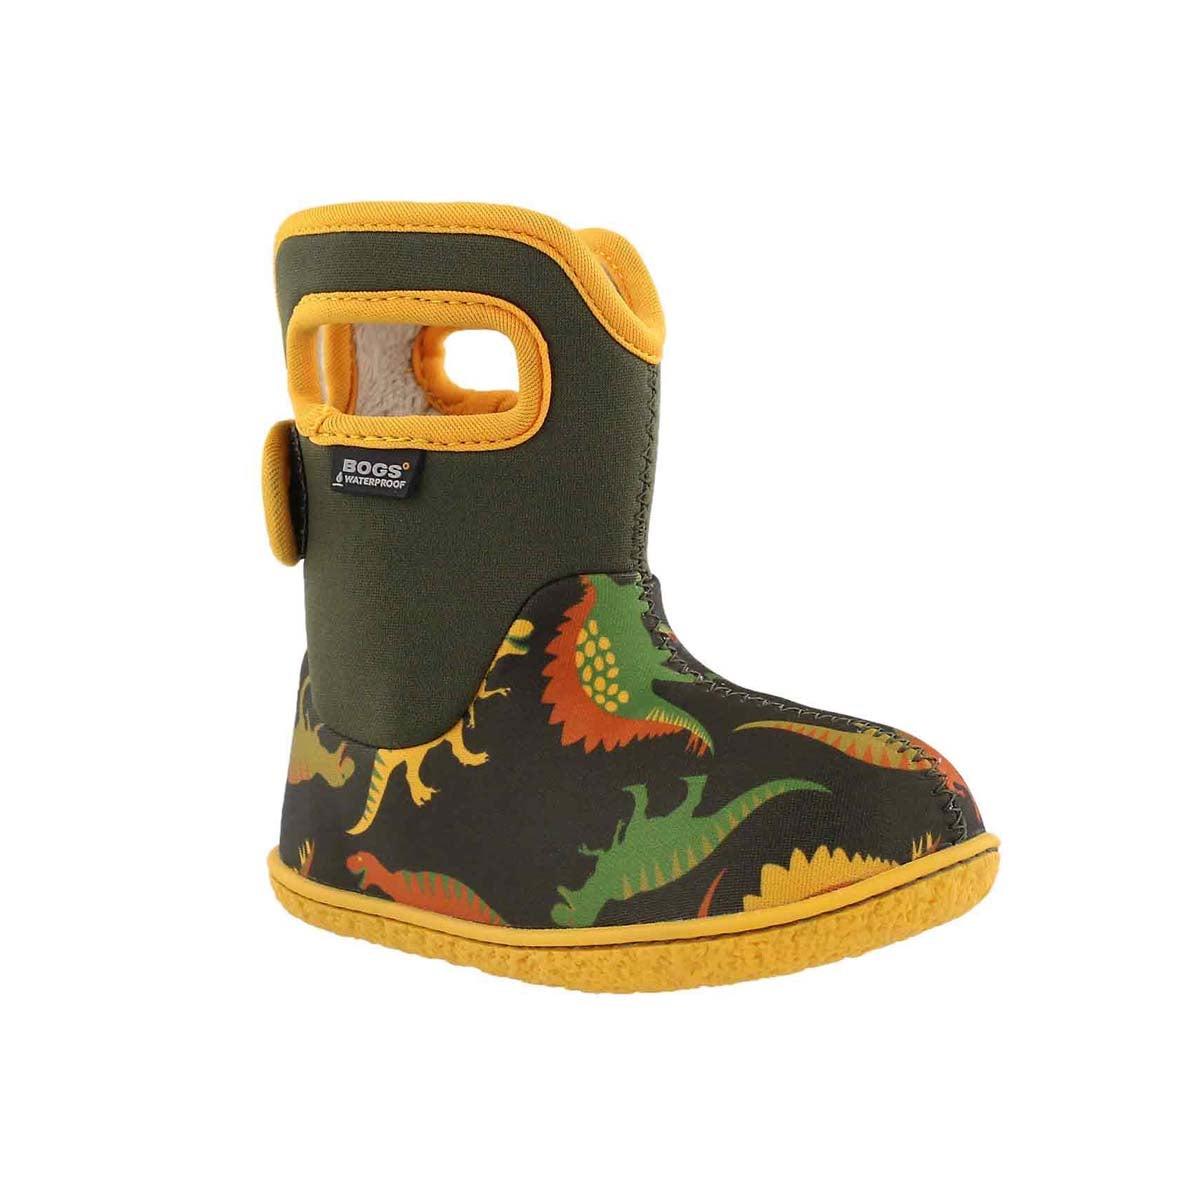 Infant boys' DINO moss boot